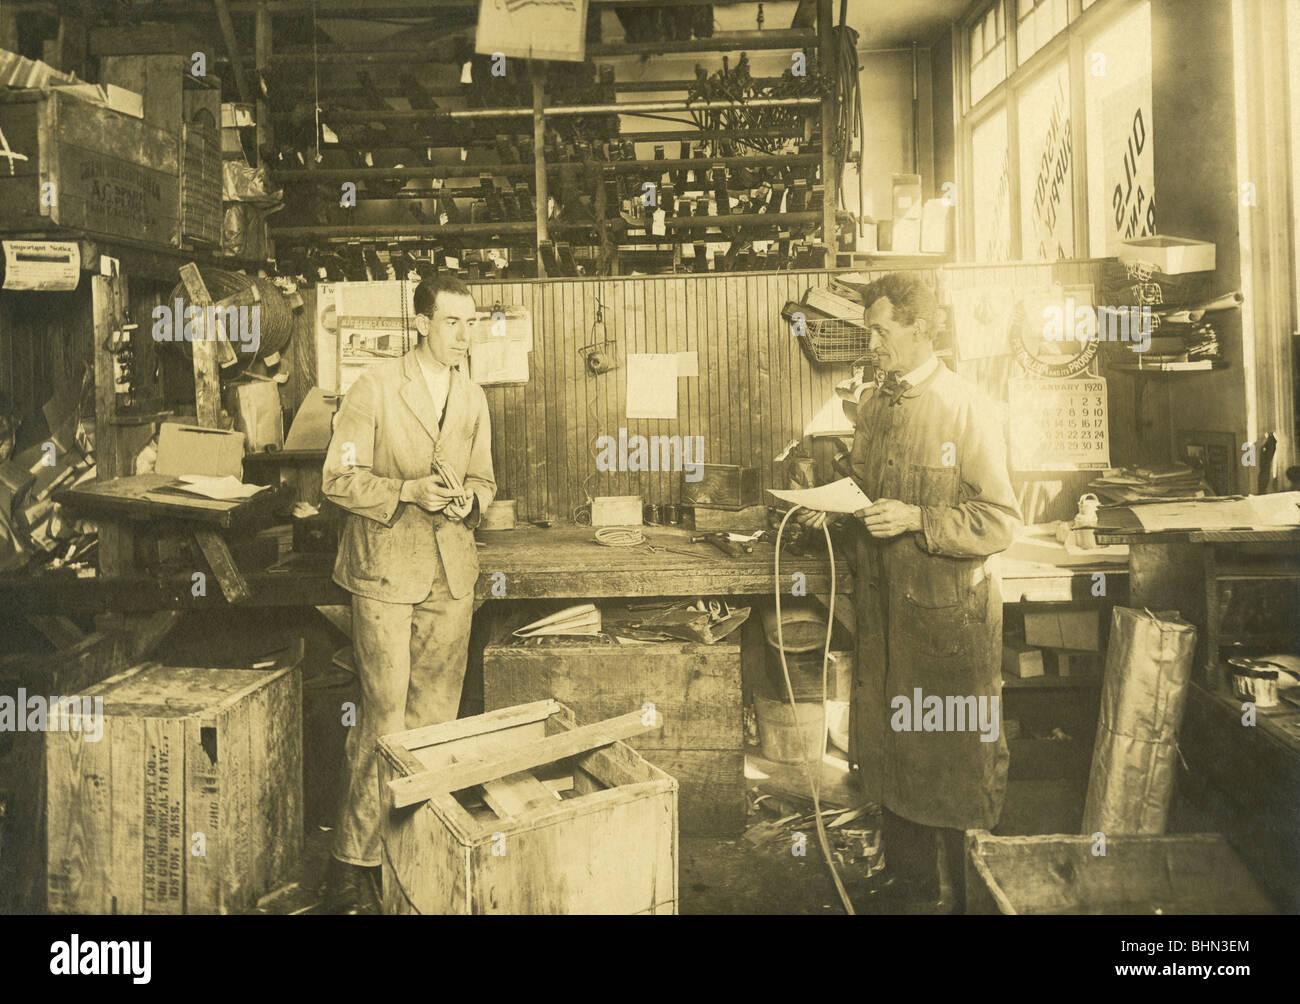 1920-Foto von der Mechaniker-Werkstatt im Linscott Motor Company, 690 Commonwealth Avenue, Boston, Massachusetts. Stockfoto